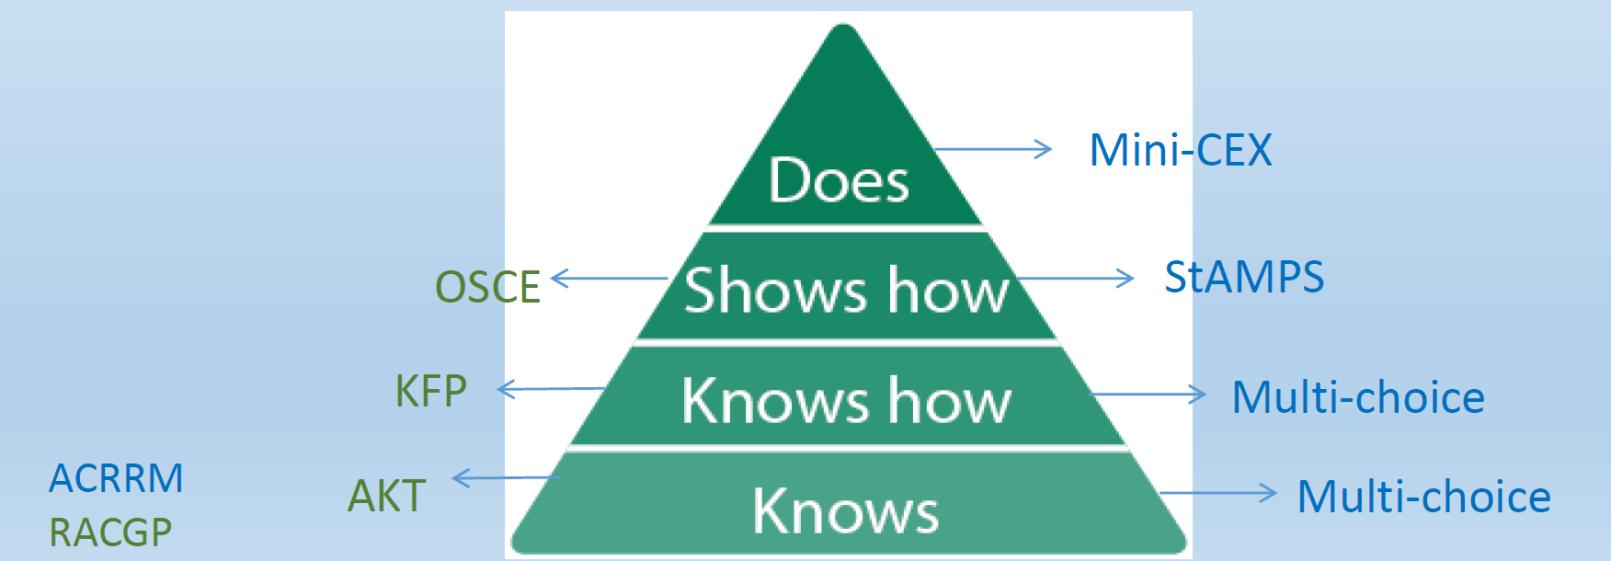 Miller's pyramid